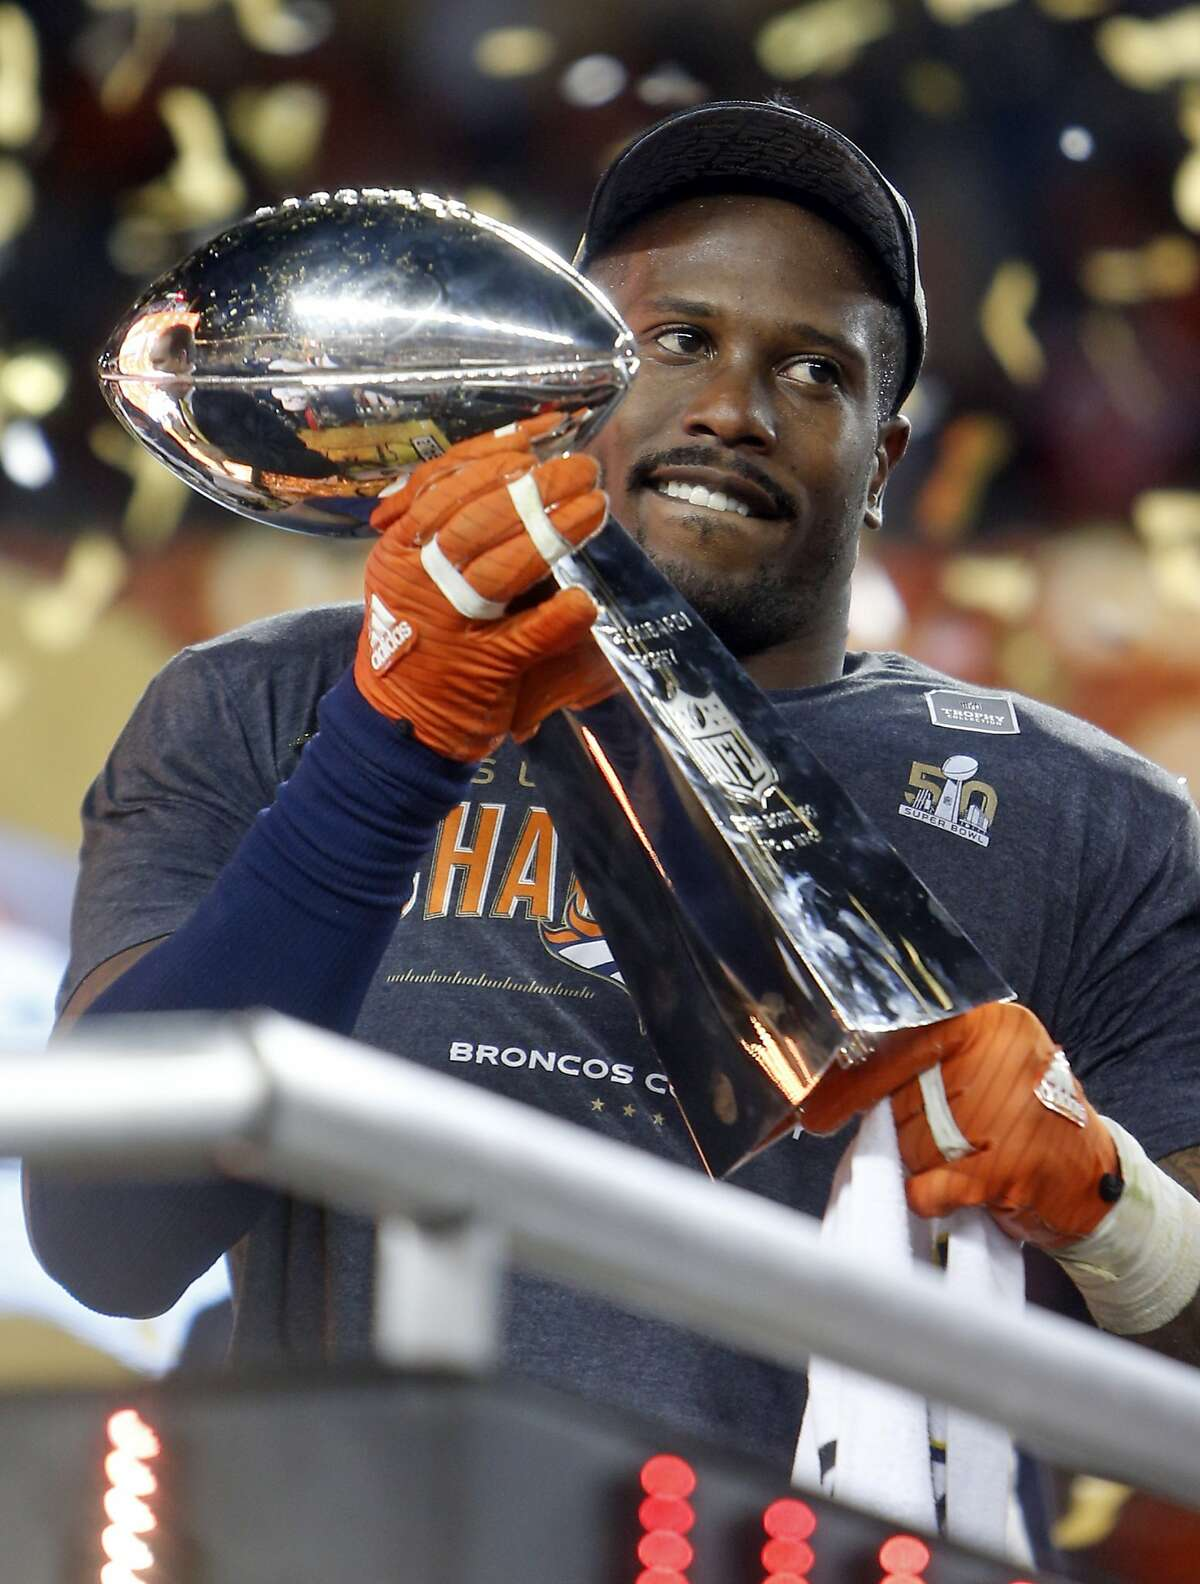 Super Bowl MVP Denver Broncos' Von Miller with Vince Lombardi trophy after 24-10 win over Carolina Panthers during Super Bowl 50 at Levi's Stadium in Santa Clara, Calif., on Sunday, February 7, 2016.